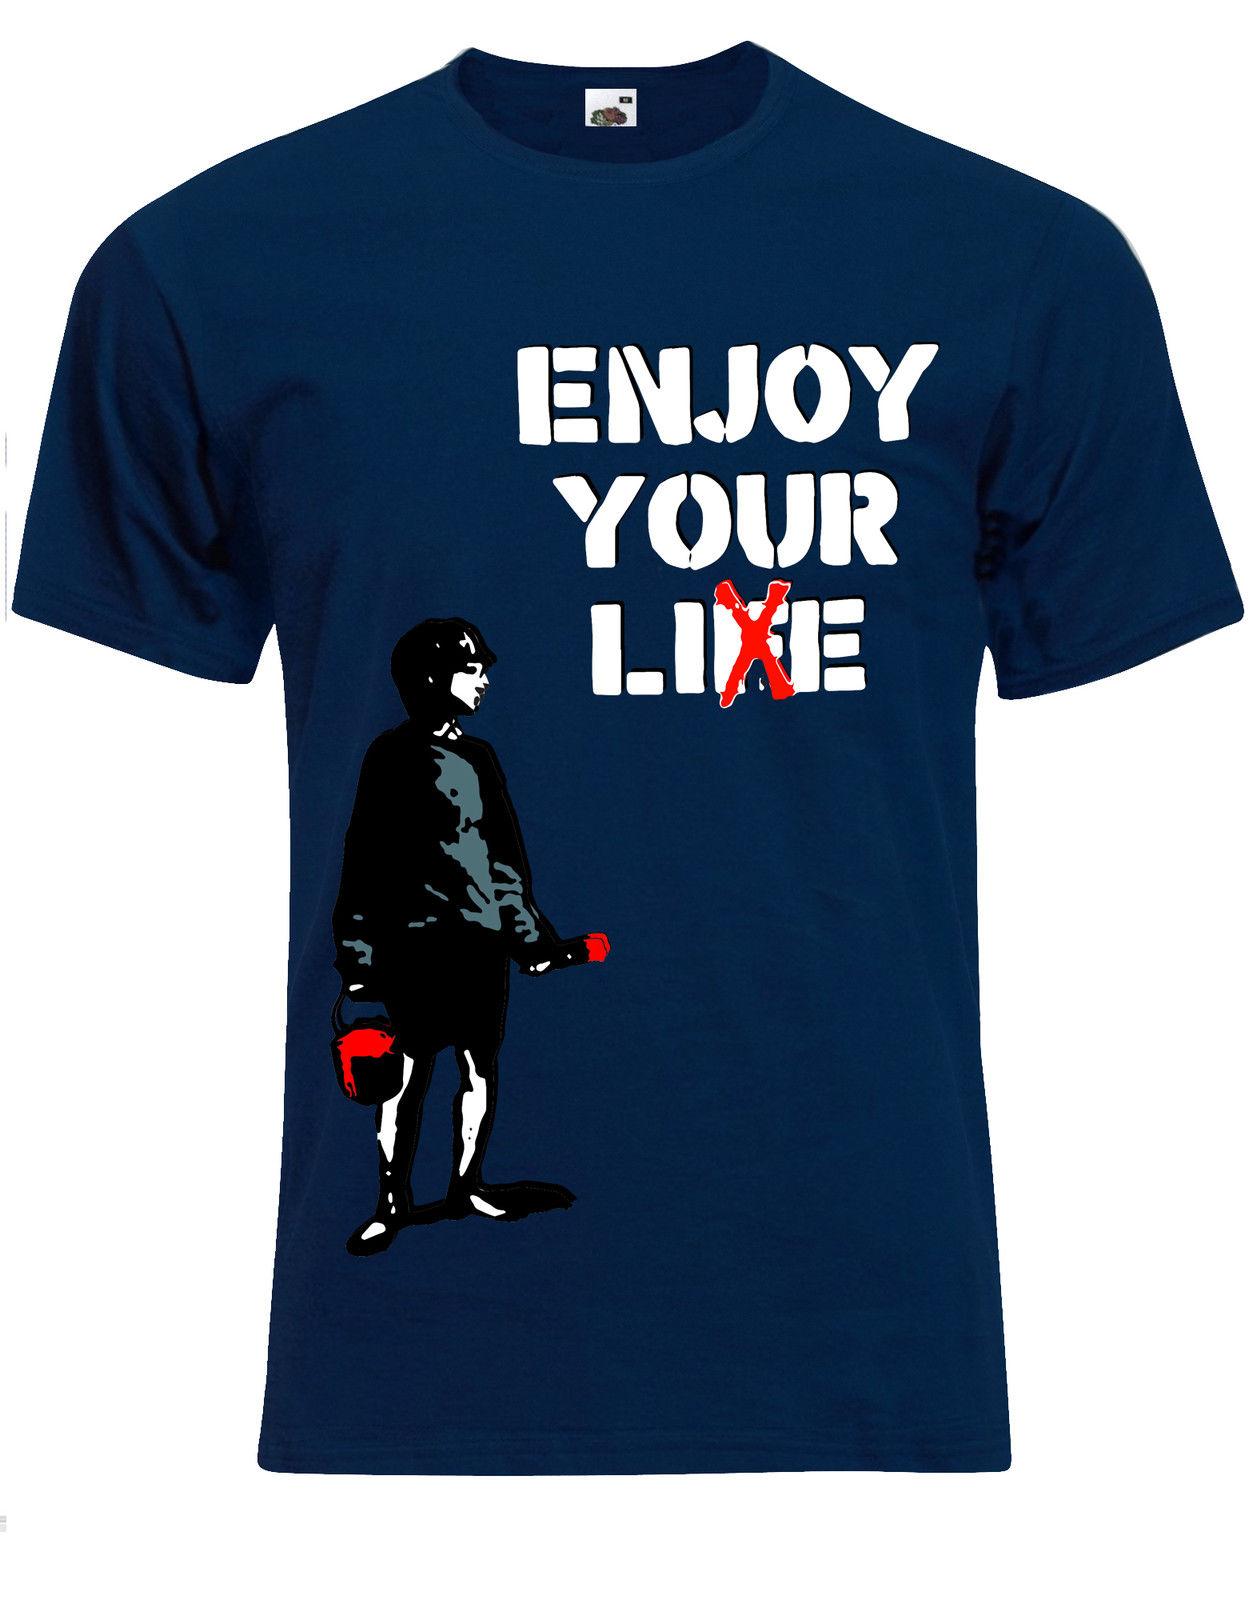 Banksy Enjoy Your Life 'Living A lie' London Street Art Mens Tshirt Tee Top AG72